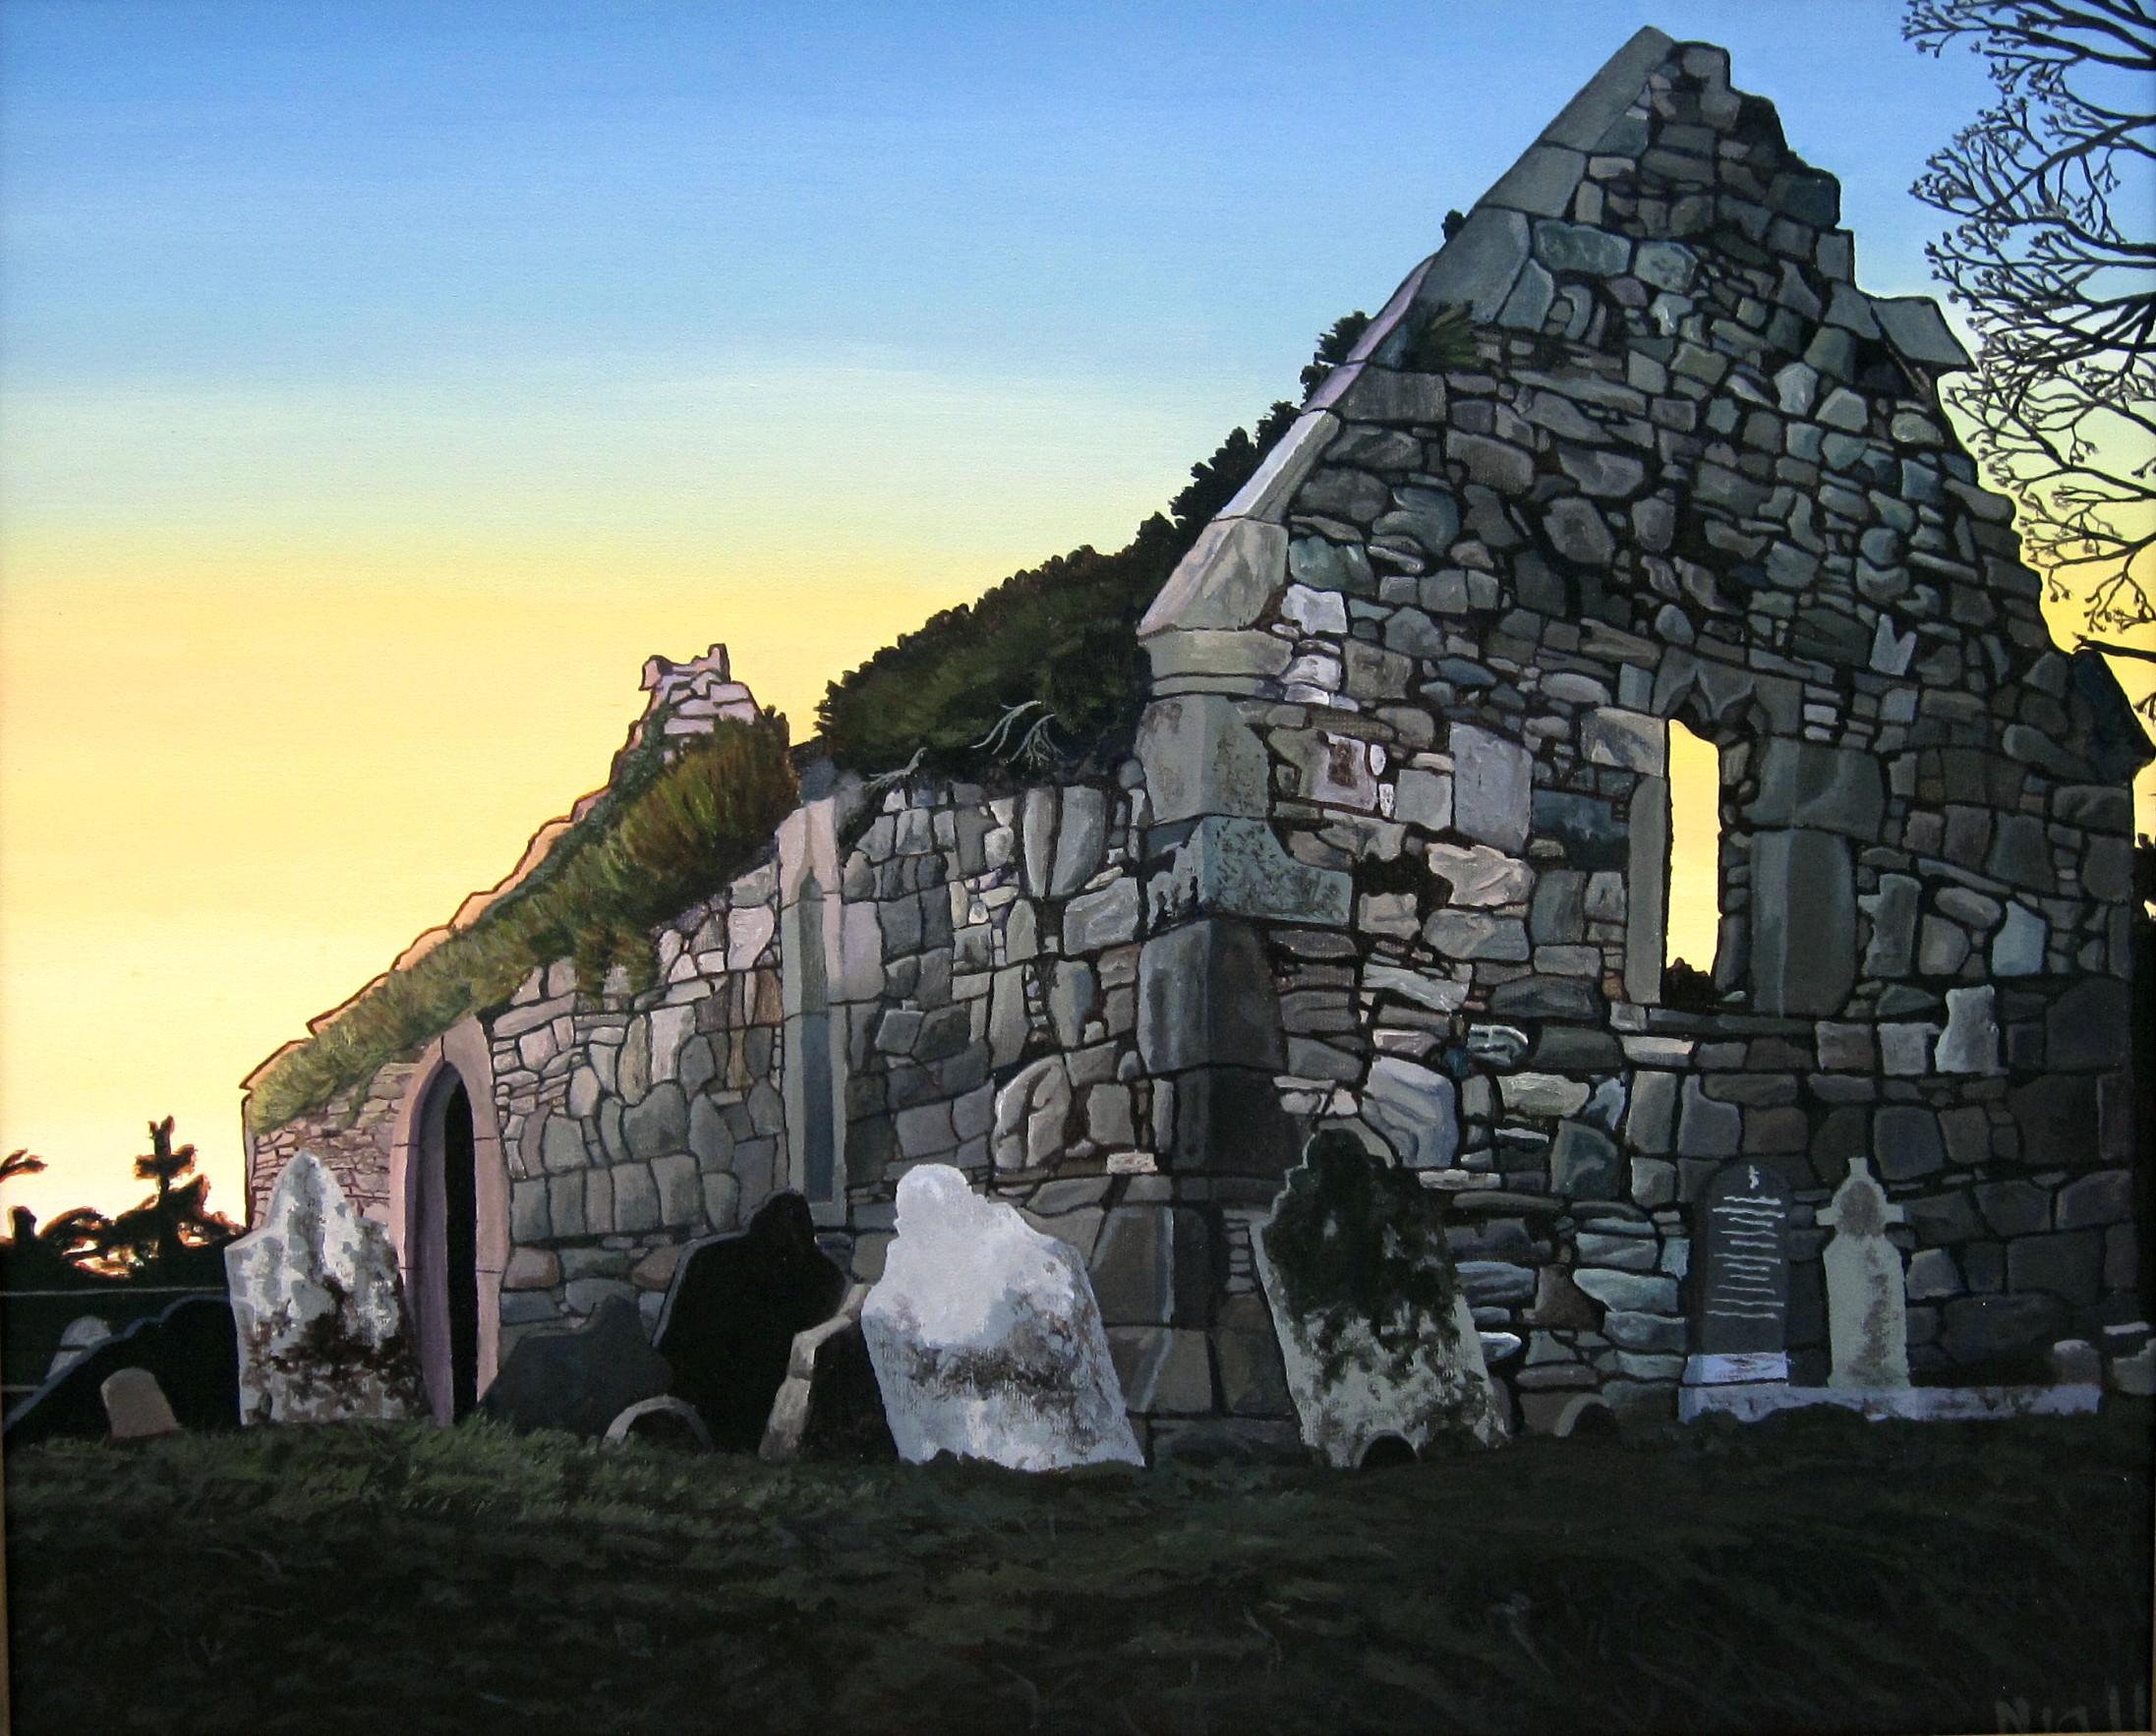 Garryvoe Church and Graveyard